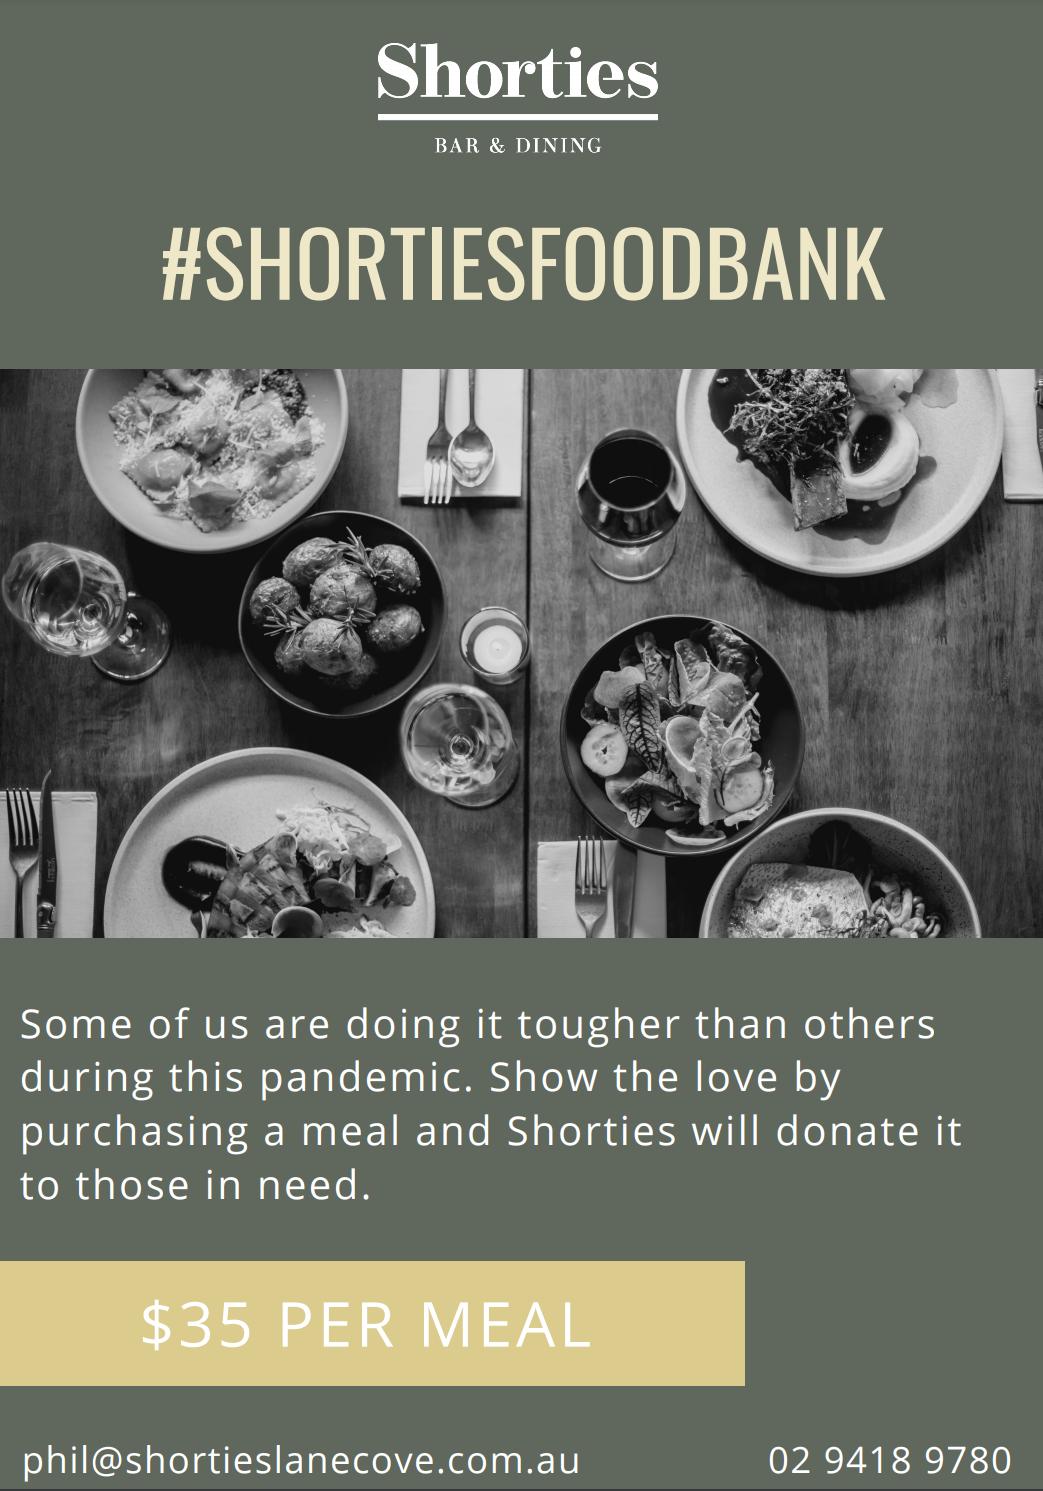 Shorties Foodbank